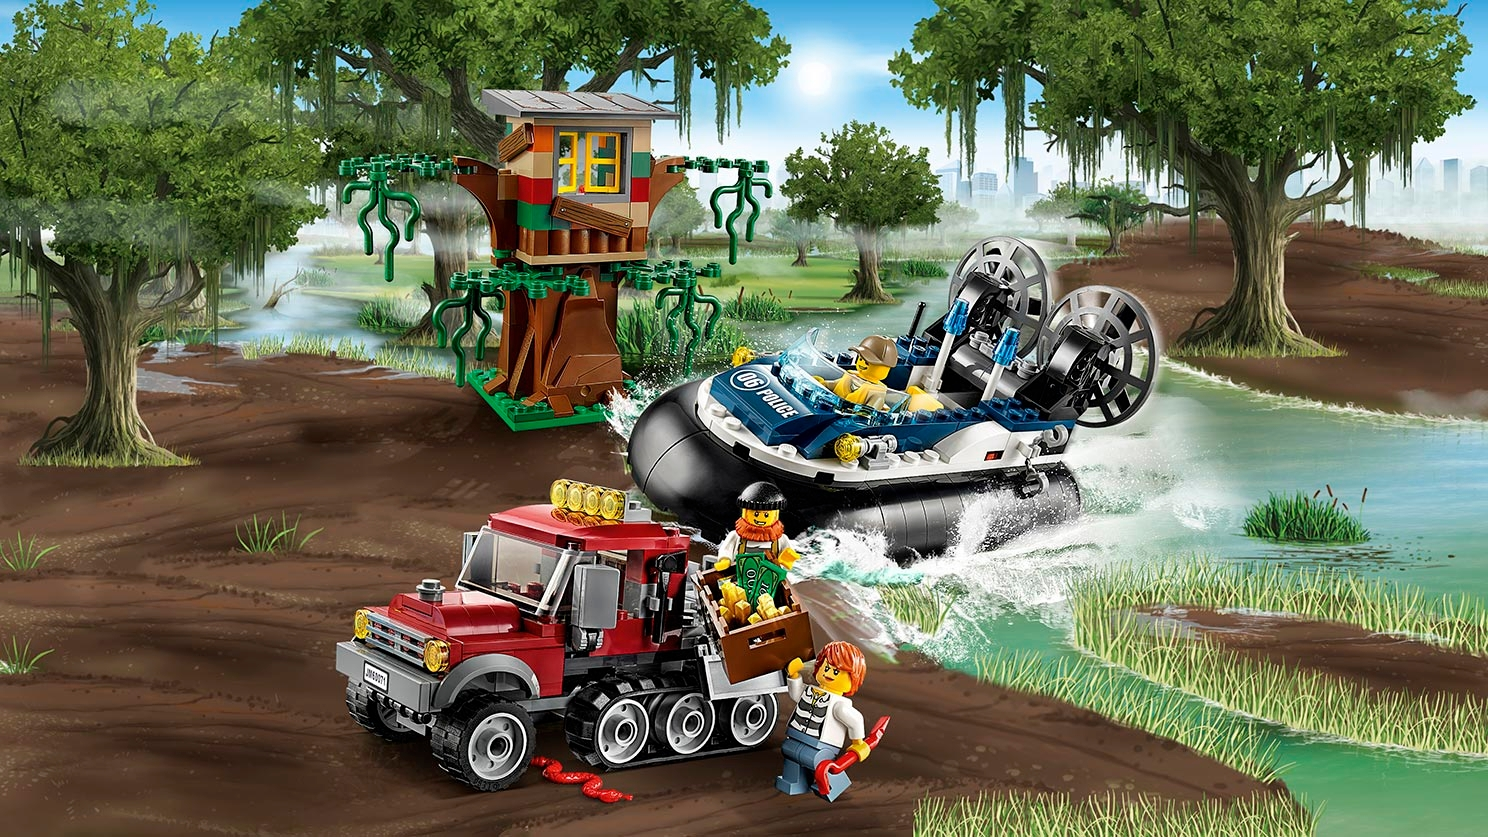 LEGO City Swamp Police chase - Hovercraft Arrest 60071